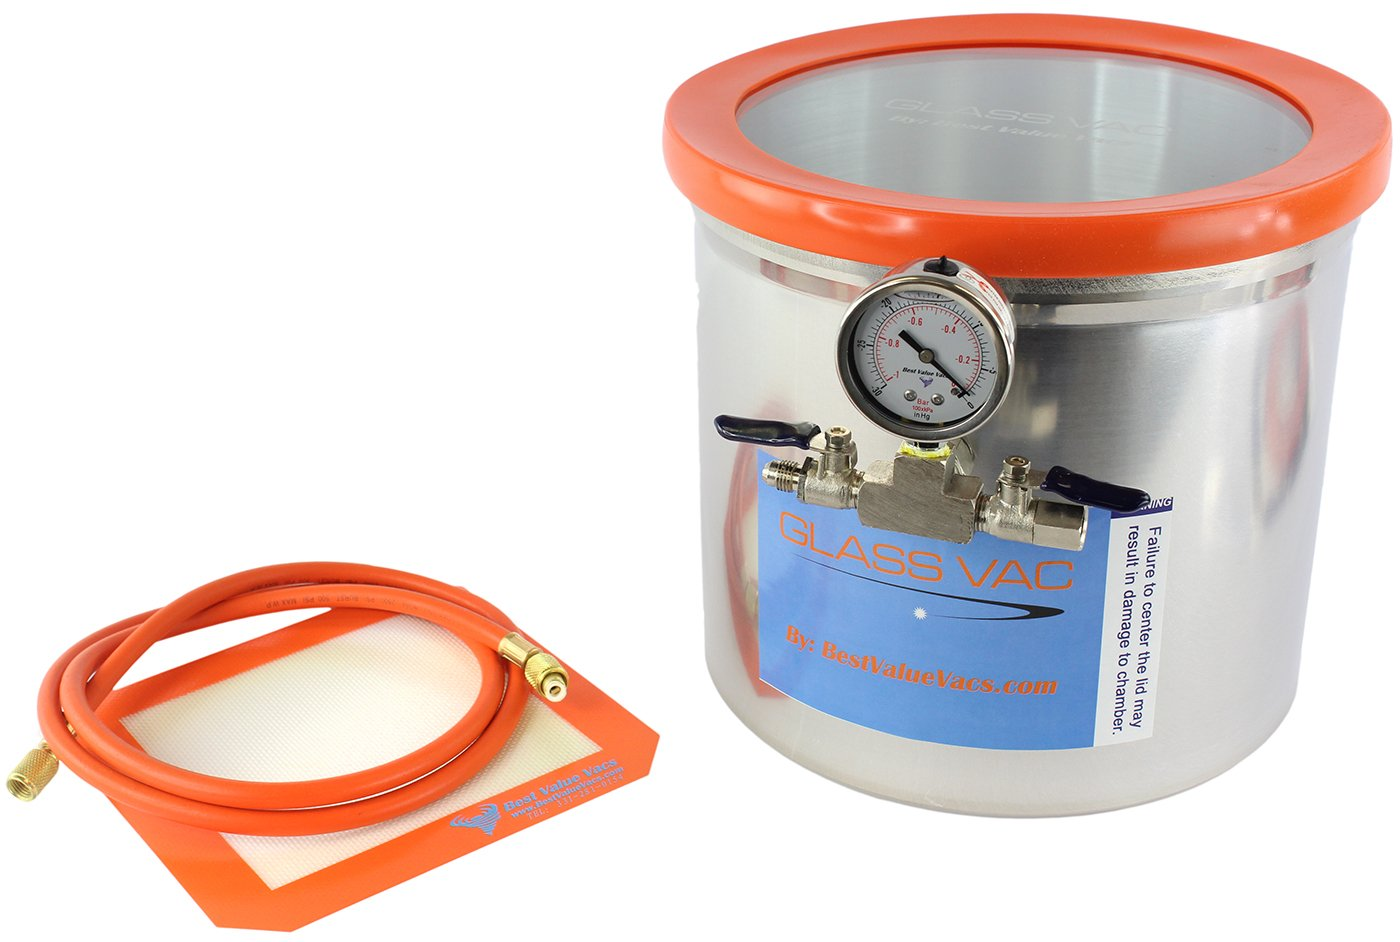 Best Value Vacs- Glass Vac Aluminum Vacuum Degassing Chamber, 3 Gallon by BEST VALUE VACS